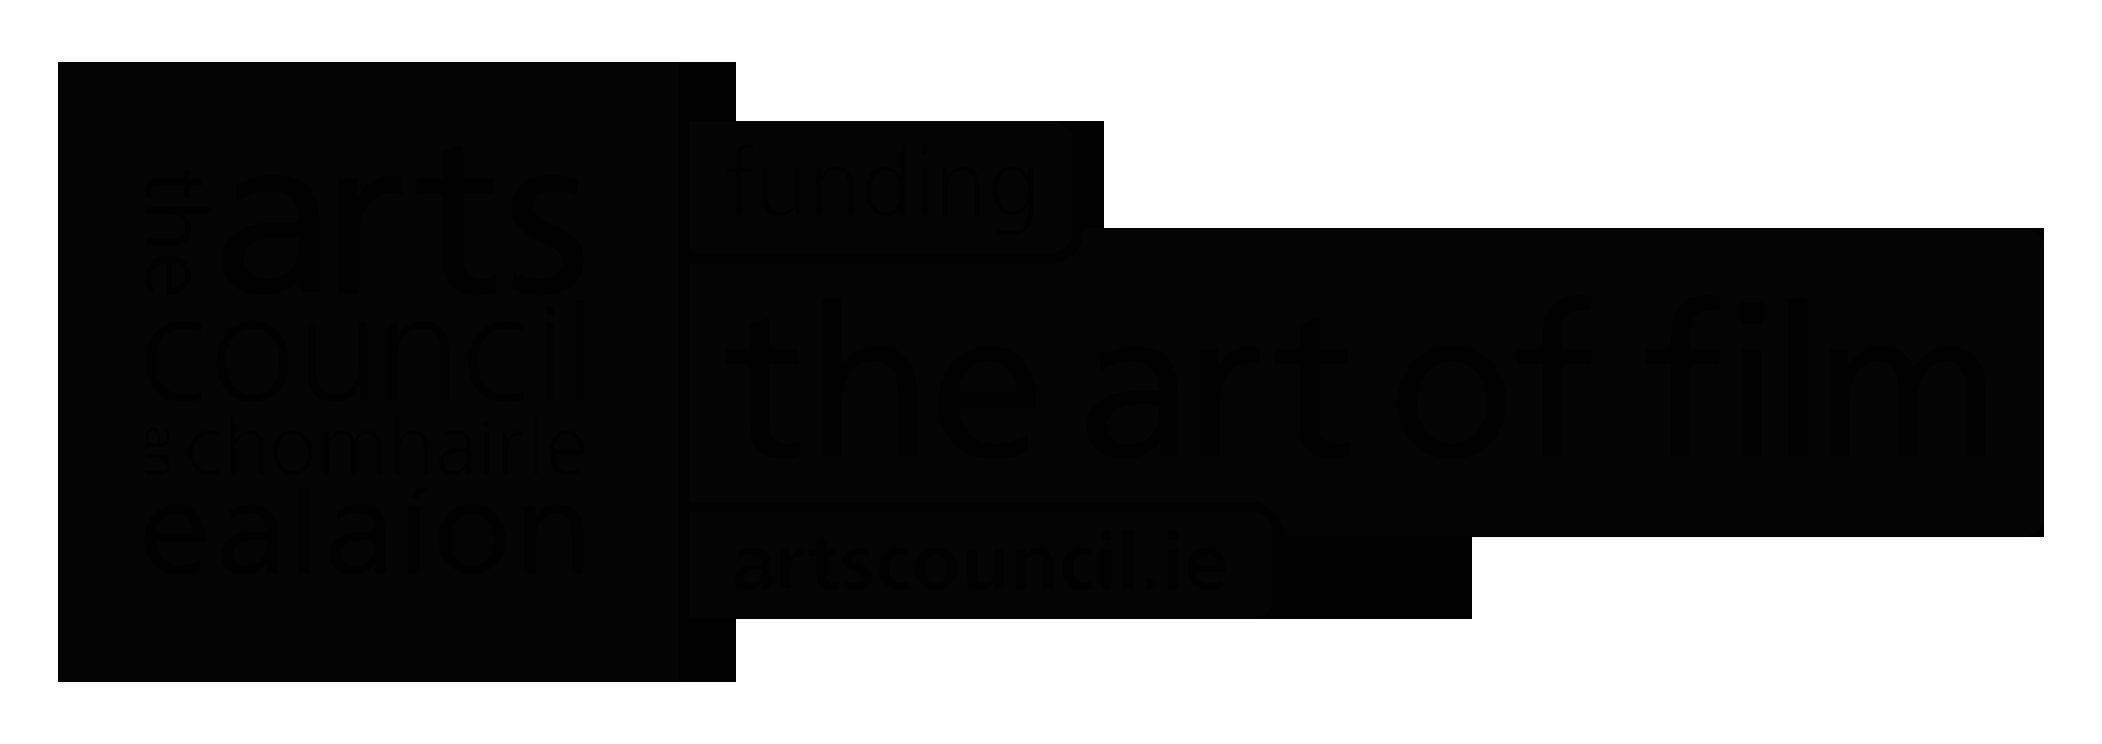 AC_FUND_ArtofFilm